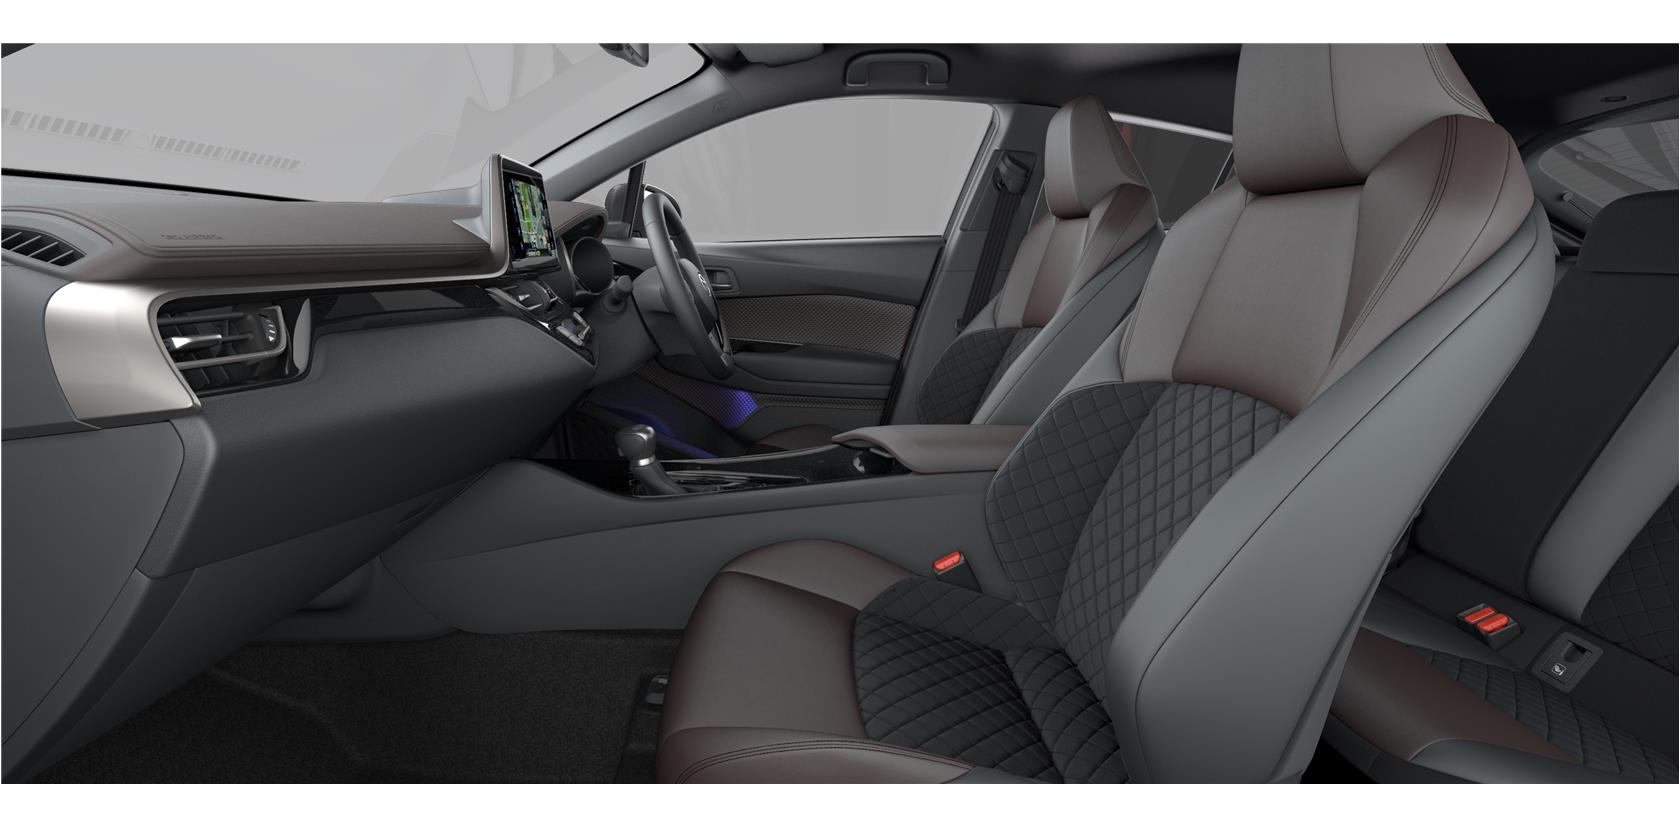 Car Paint Colors >> Toyota C-HR interior colors - Tax Free Car Hub Seychelles